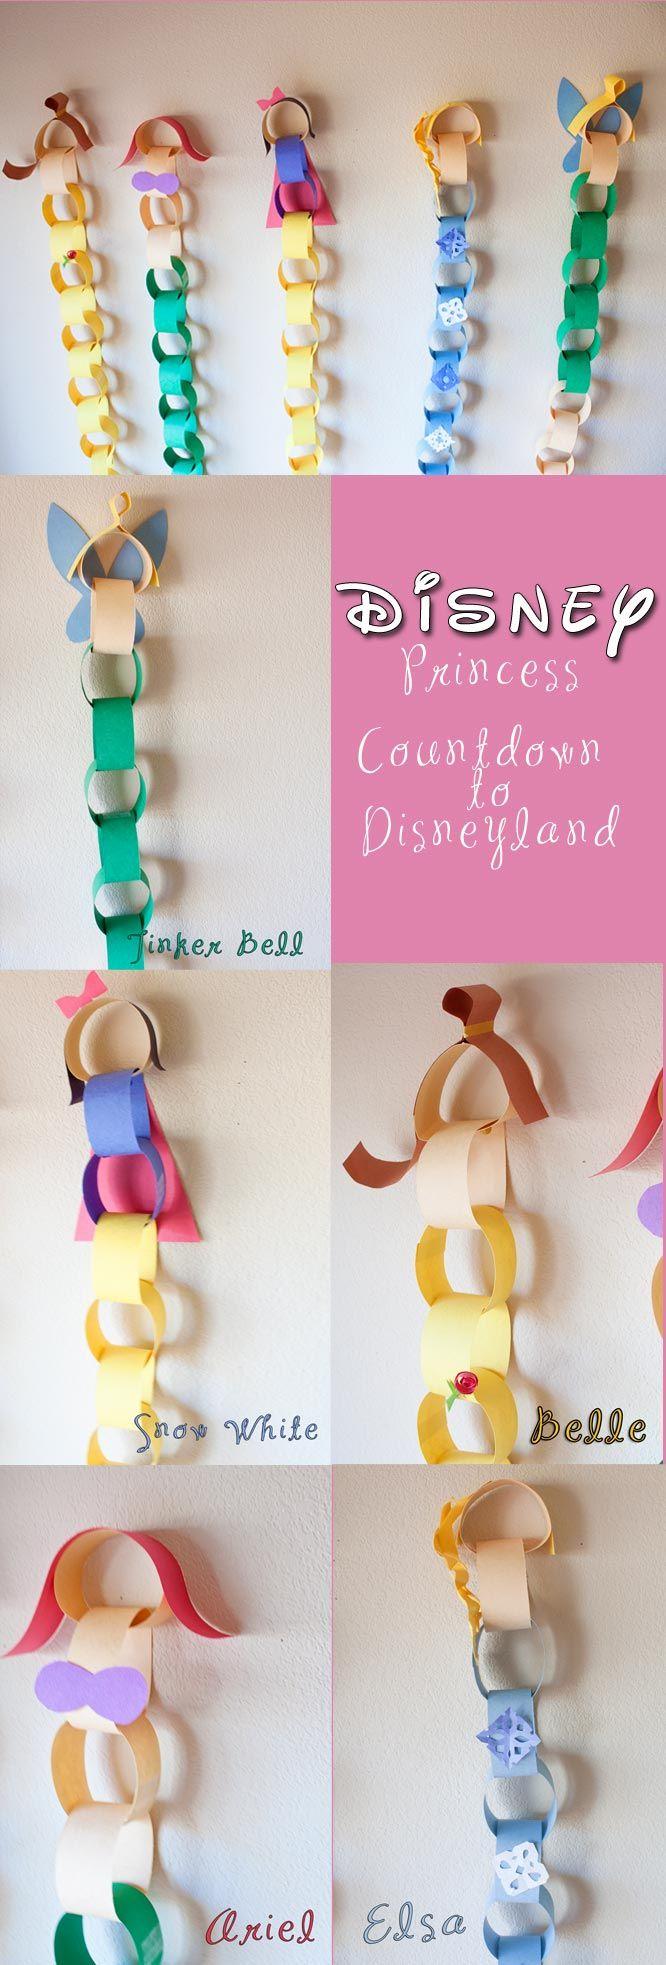 Disneyland Countdown with the Disney Princesses! How cute! #passporter